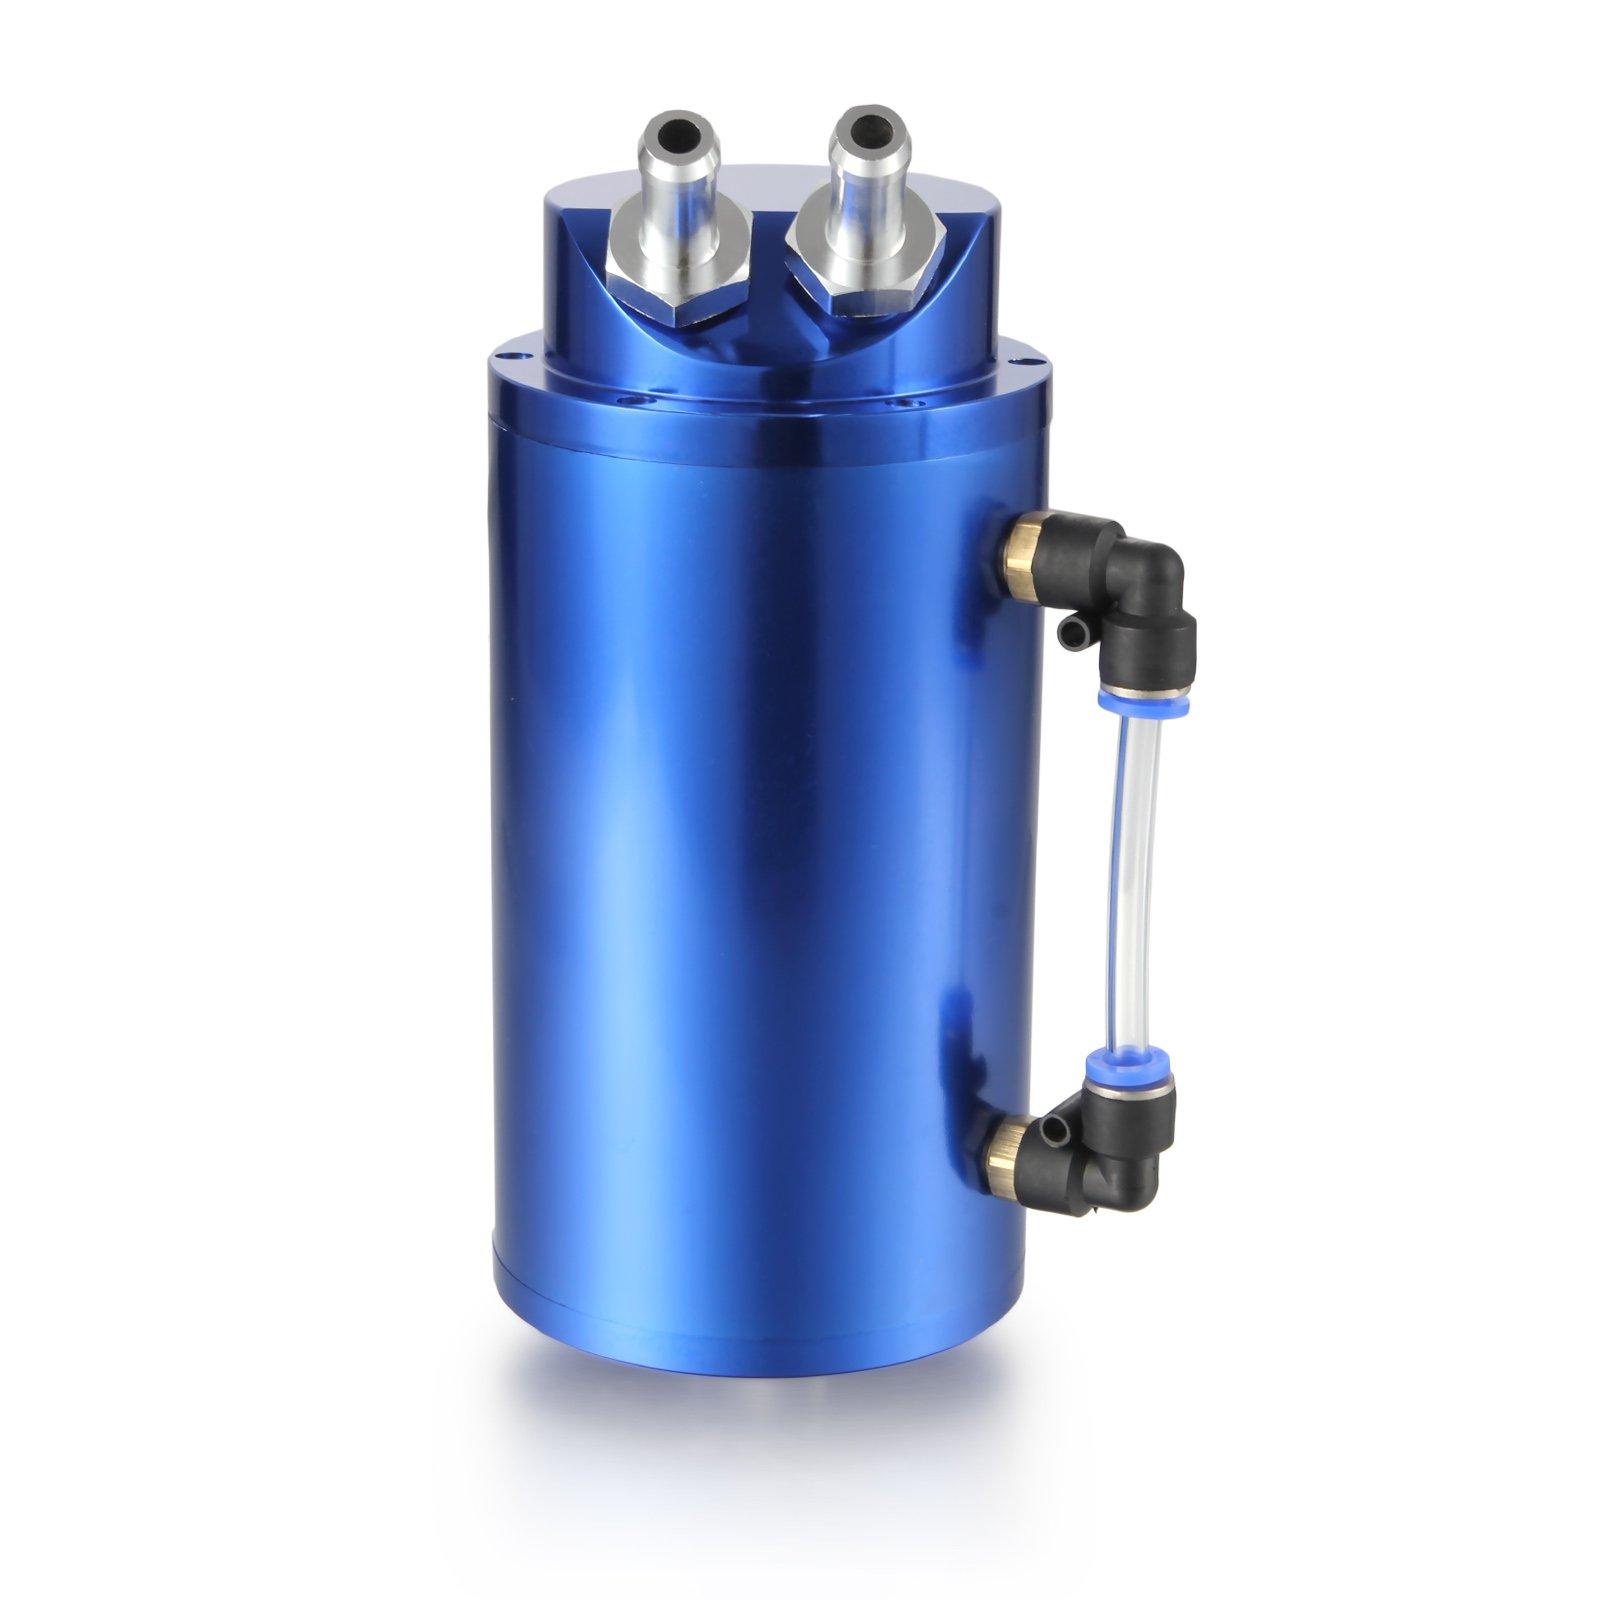 Dromedary Blue Aluminum Oil Reservoir Catch Can Tank Kit Breather Filter Baffled by Dromedary